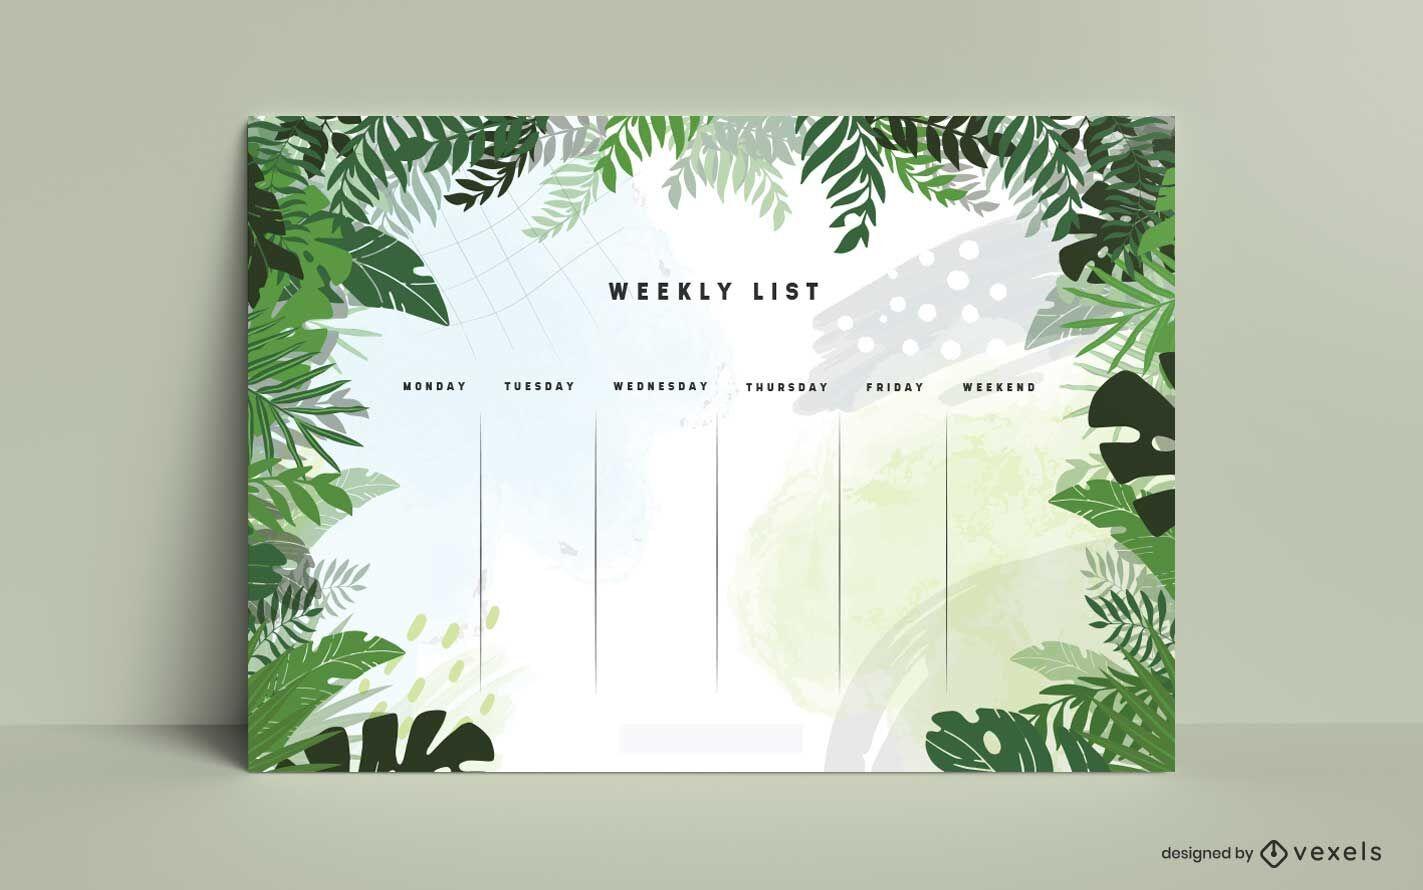 Dise?o de planificador semanal de hojas de selva.